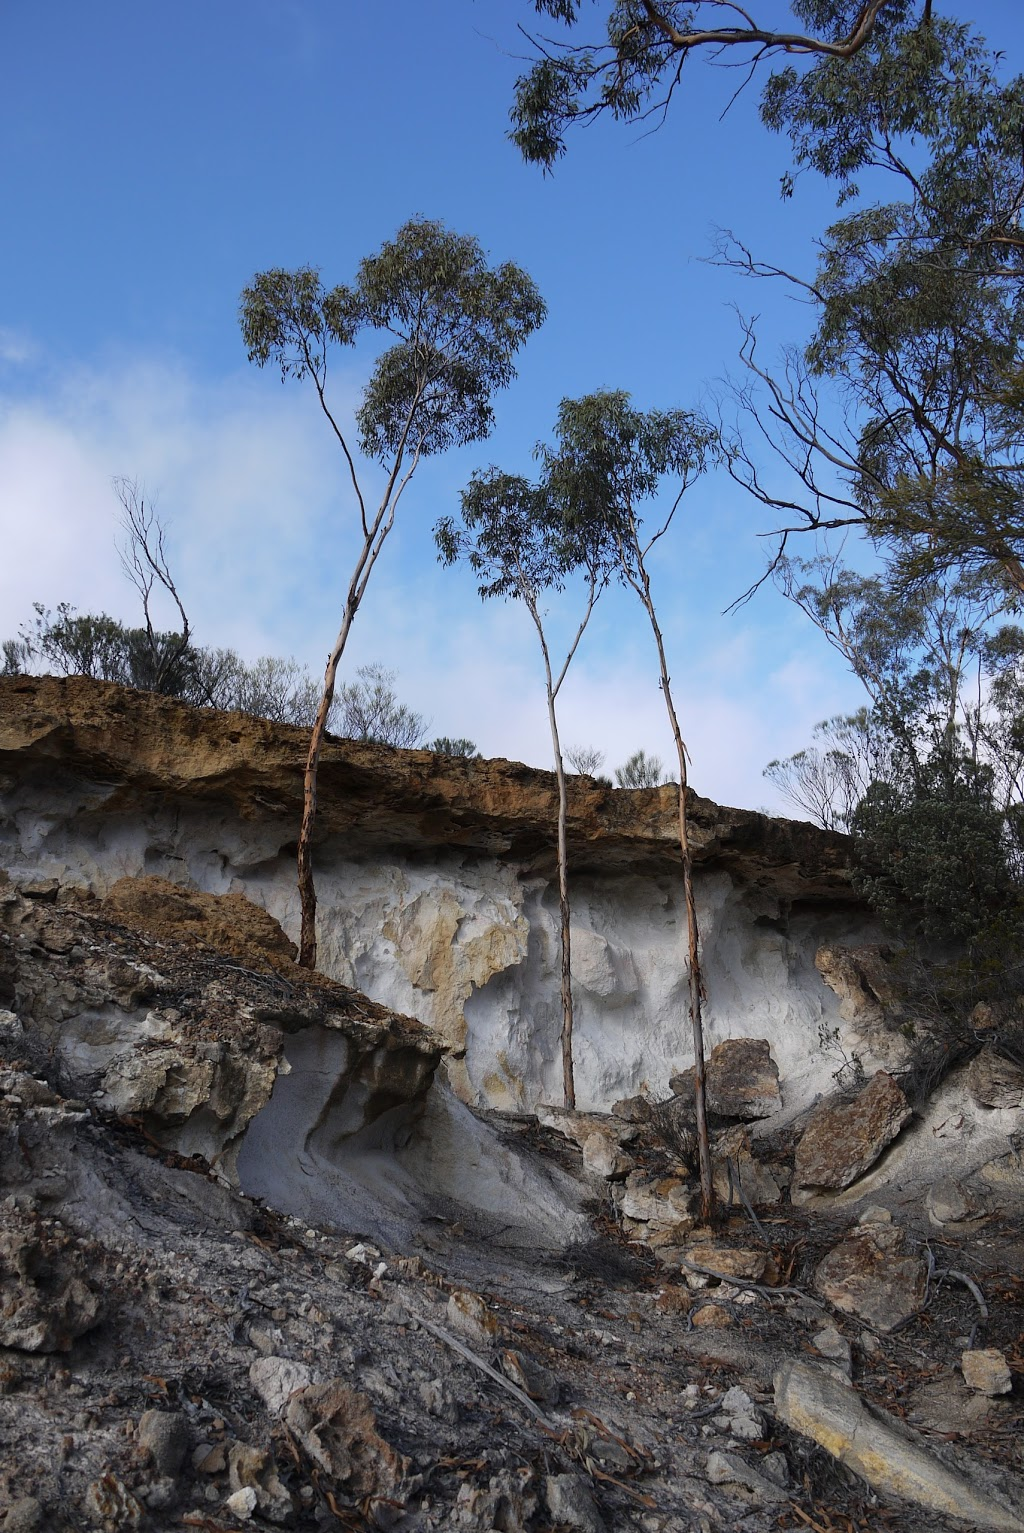 Chiddarcooping Nature Reserve Sign | park | Morrison Rd, Warralakin WA 6421, Australia